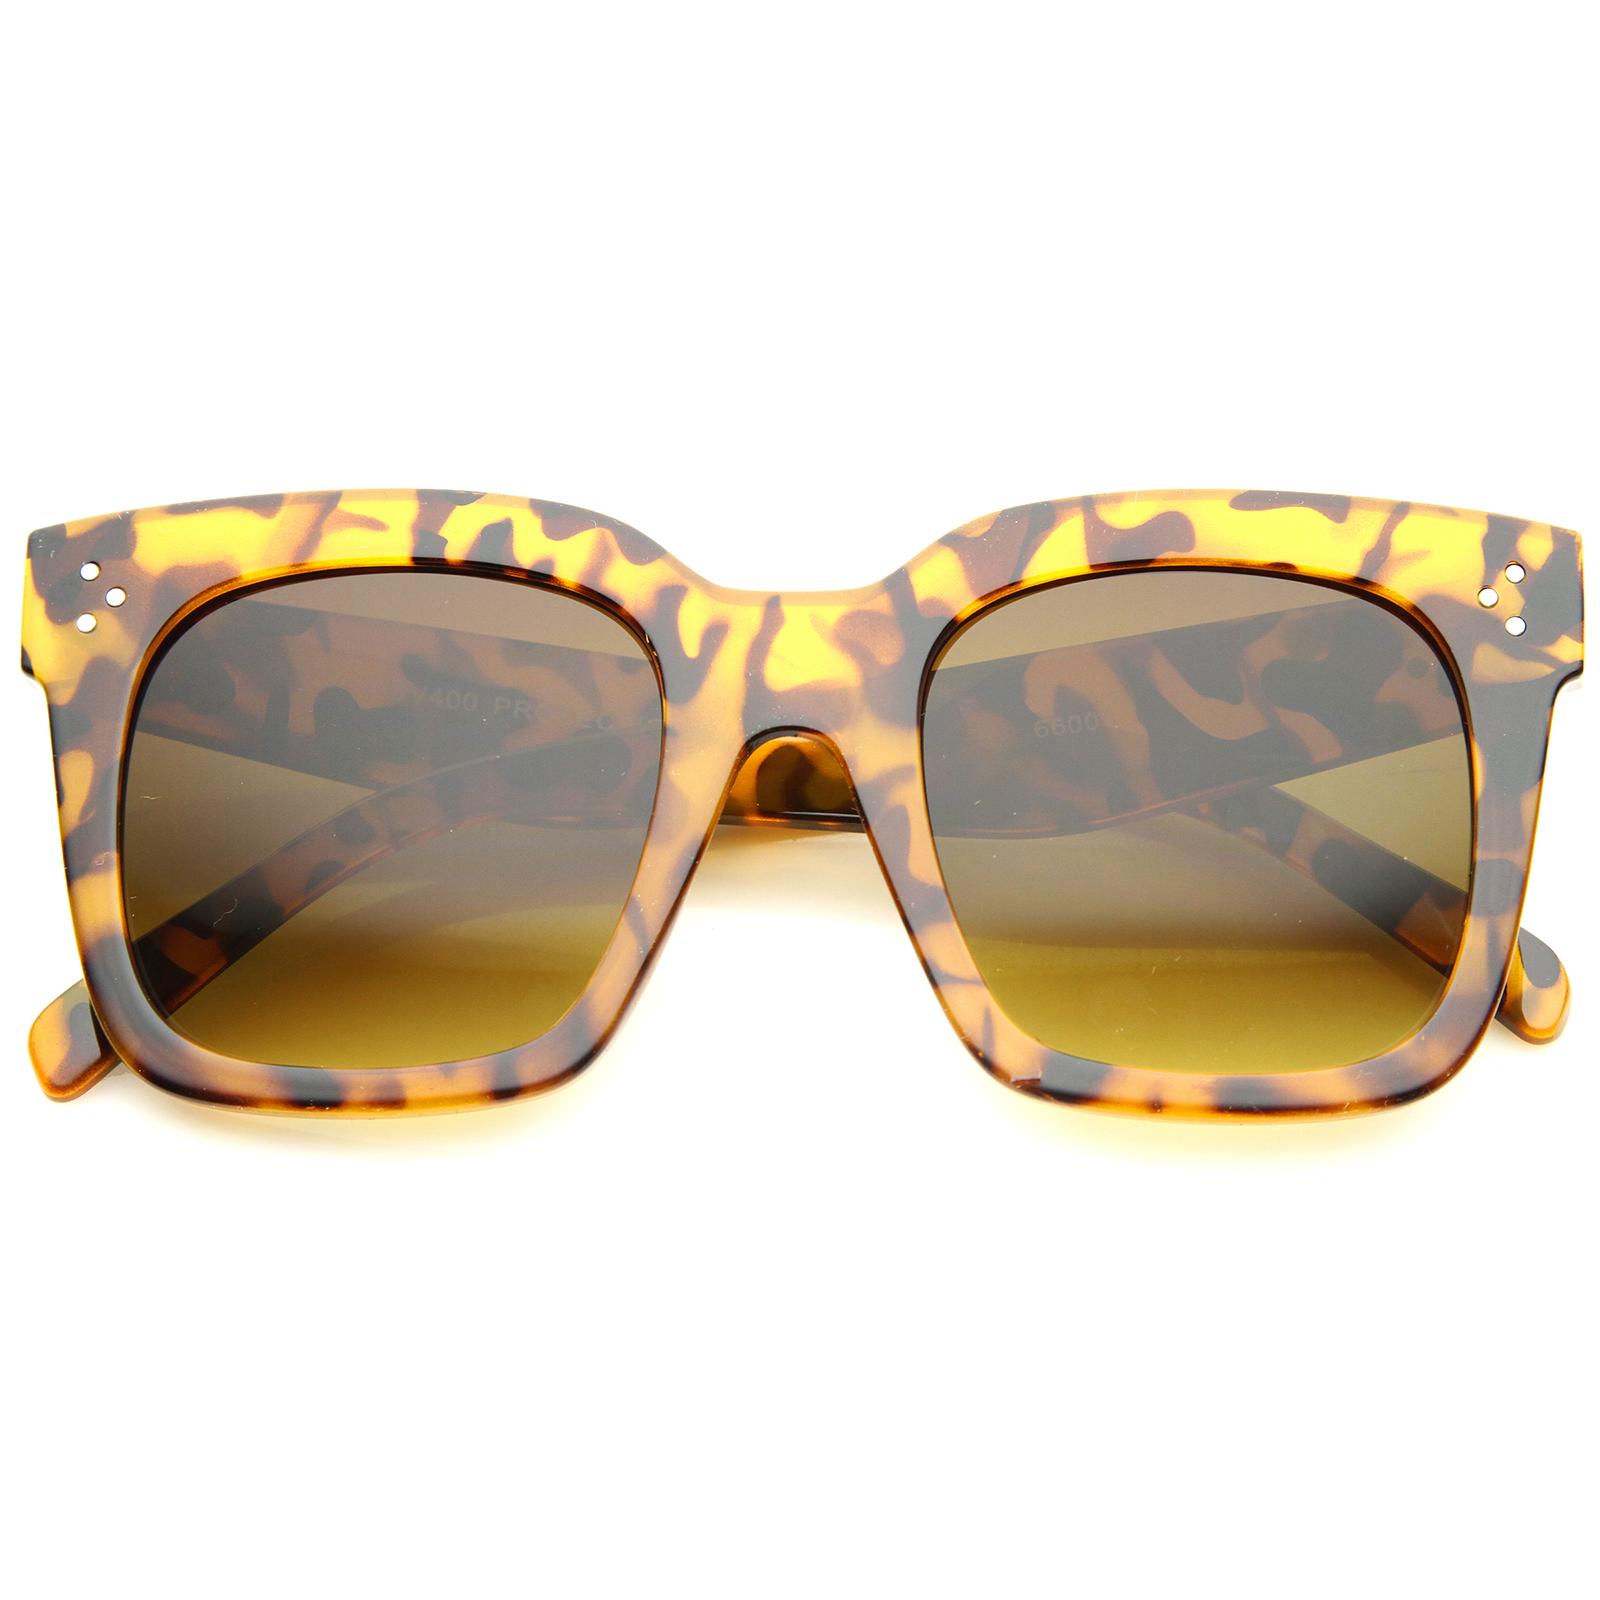 sunglassLA - Bold Oversize Tinted Flat Lens Square Horn Rimmed Sunglasses - 51mm